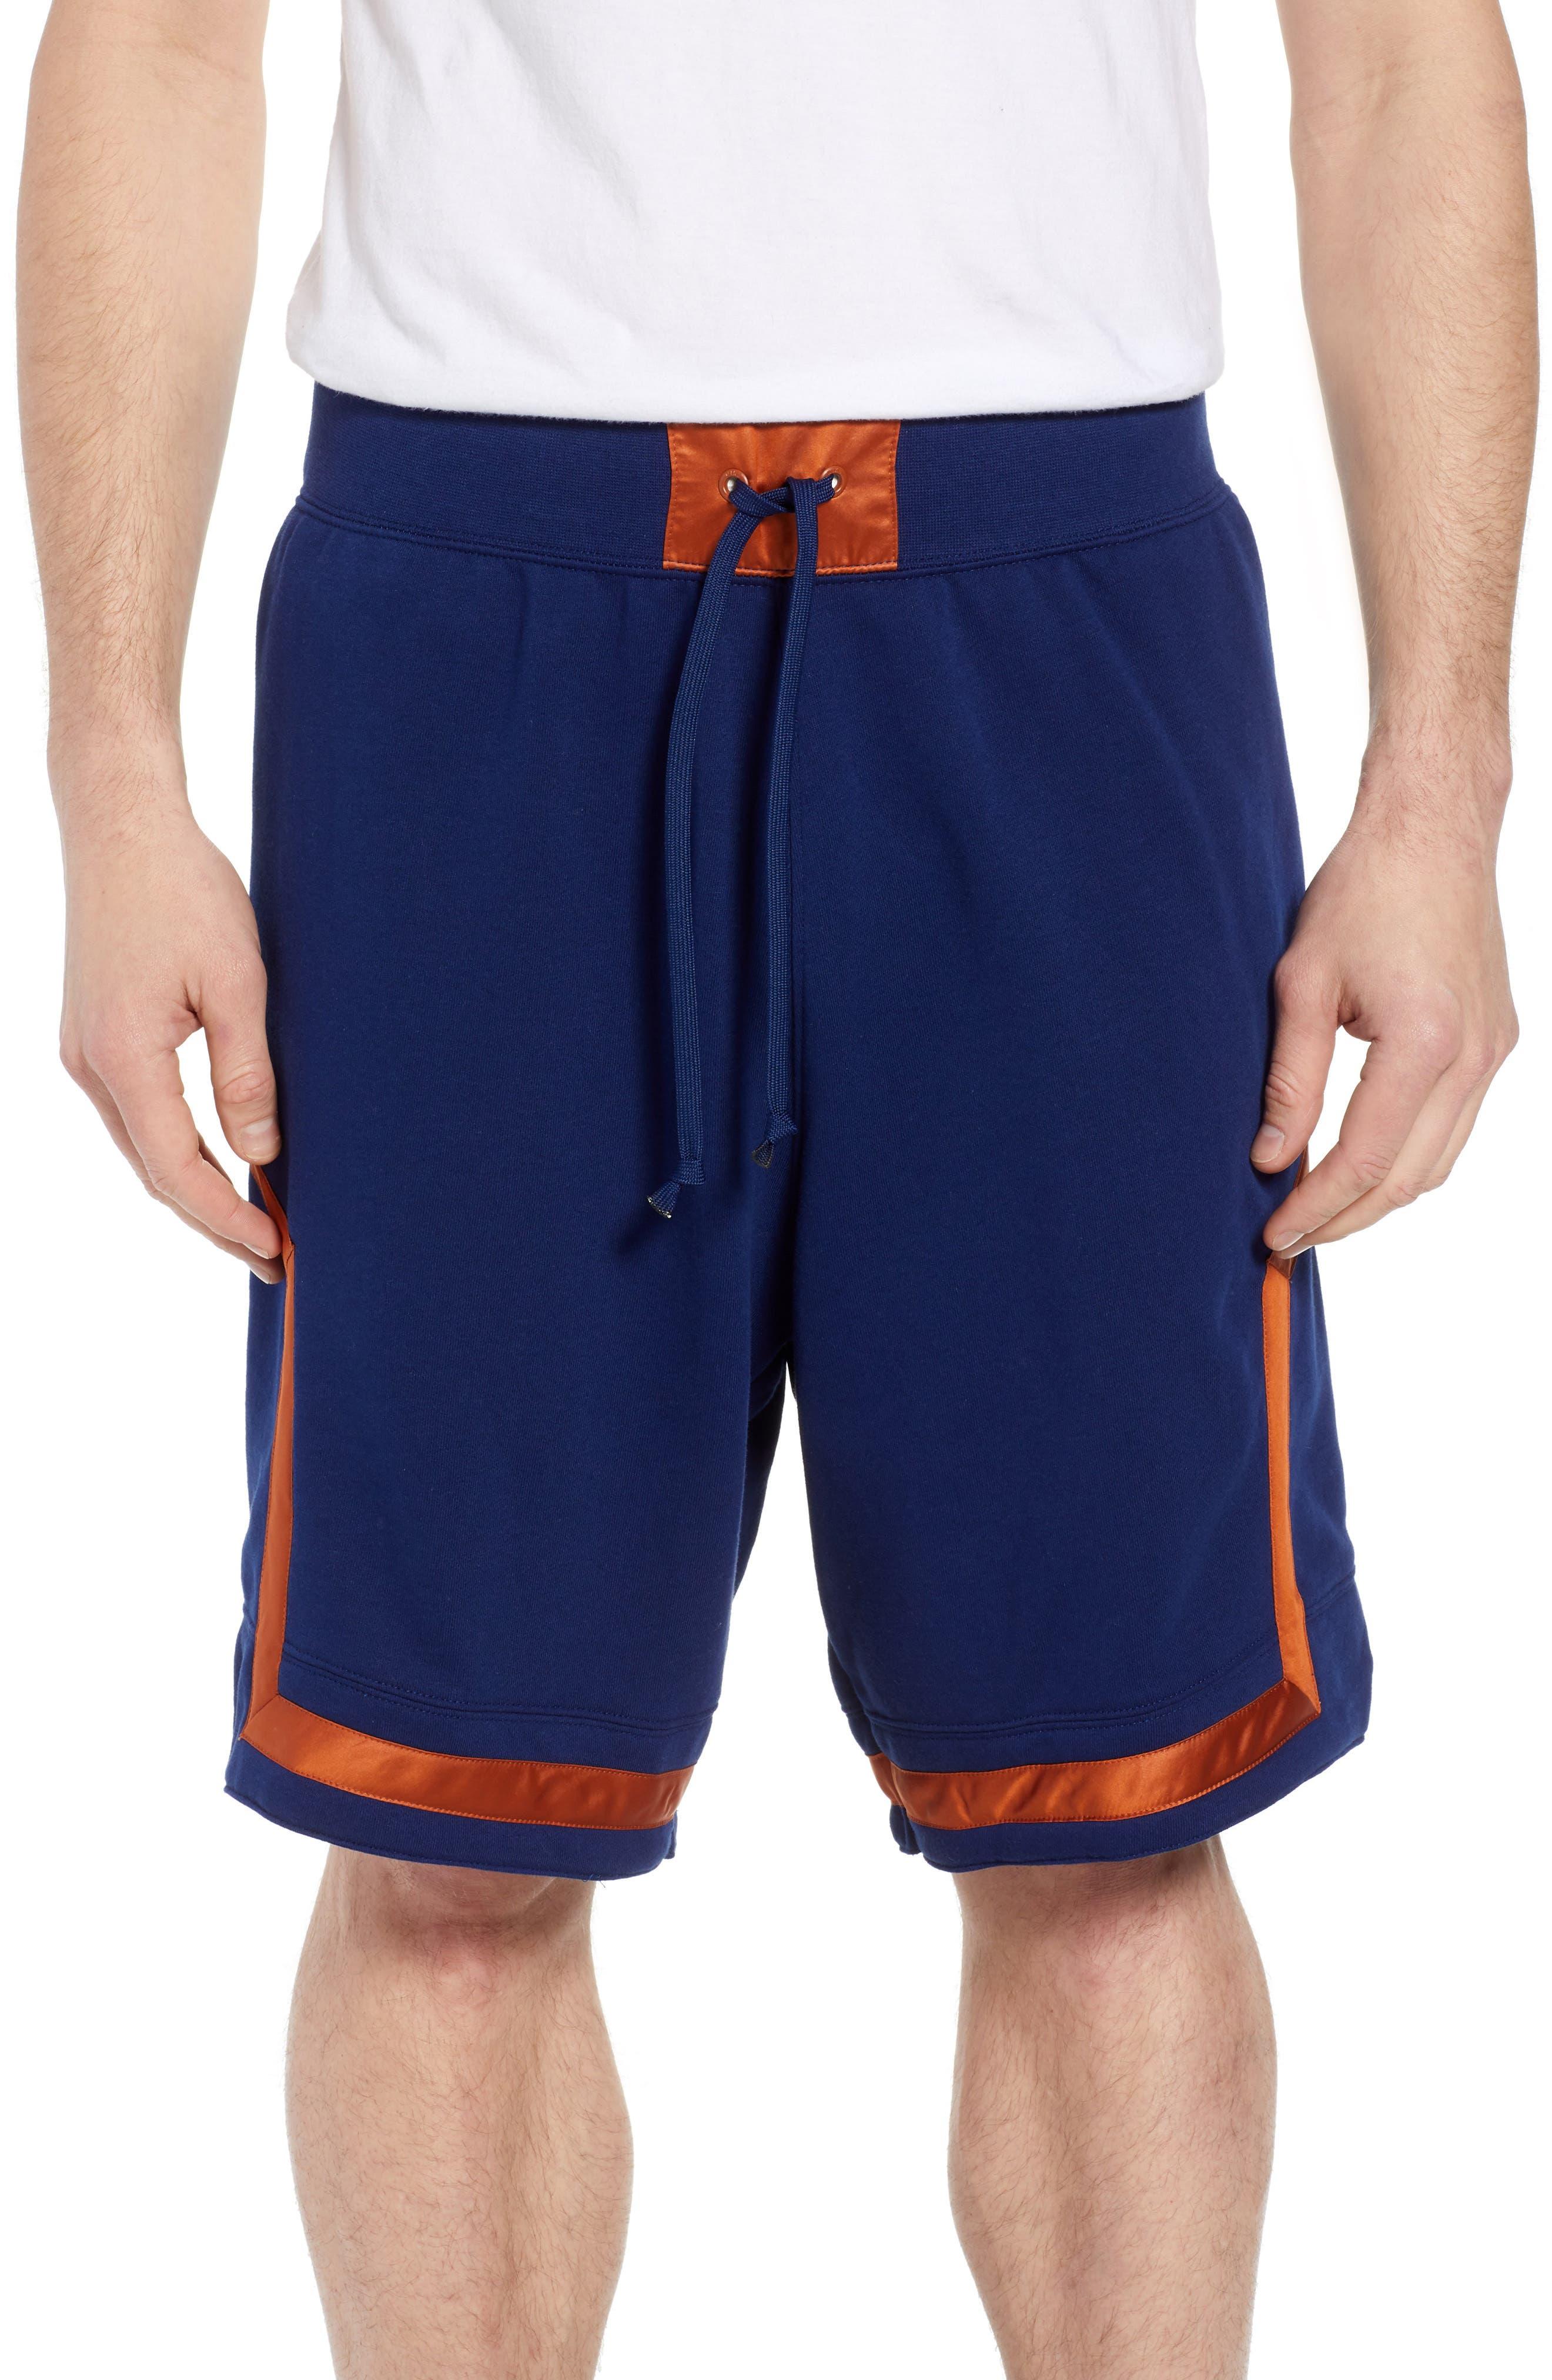 Nike Air Force One Shorts